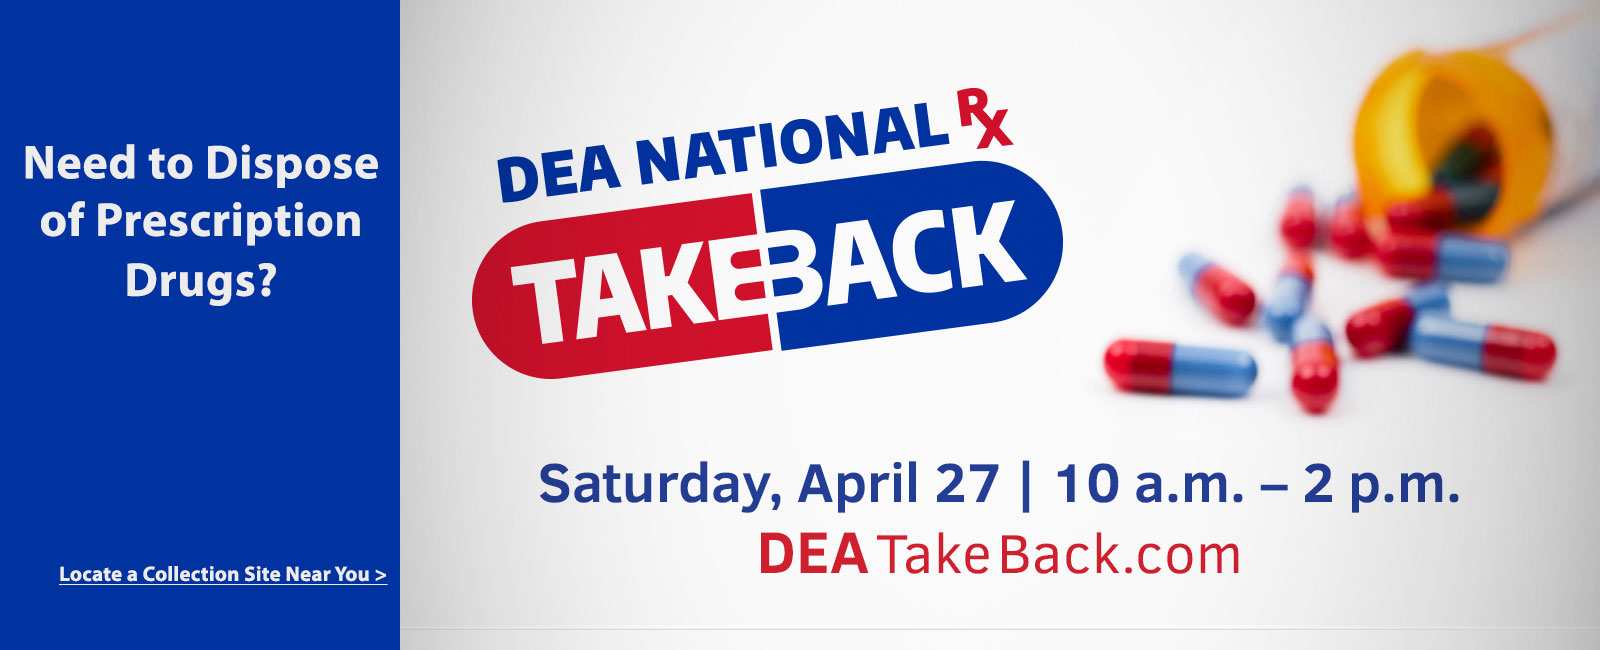 DEA National Take Back Day